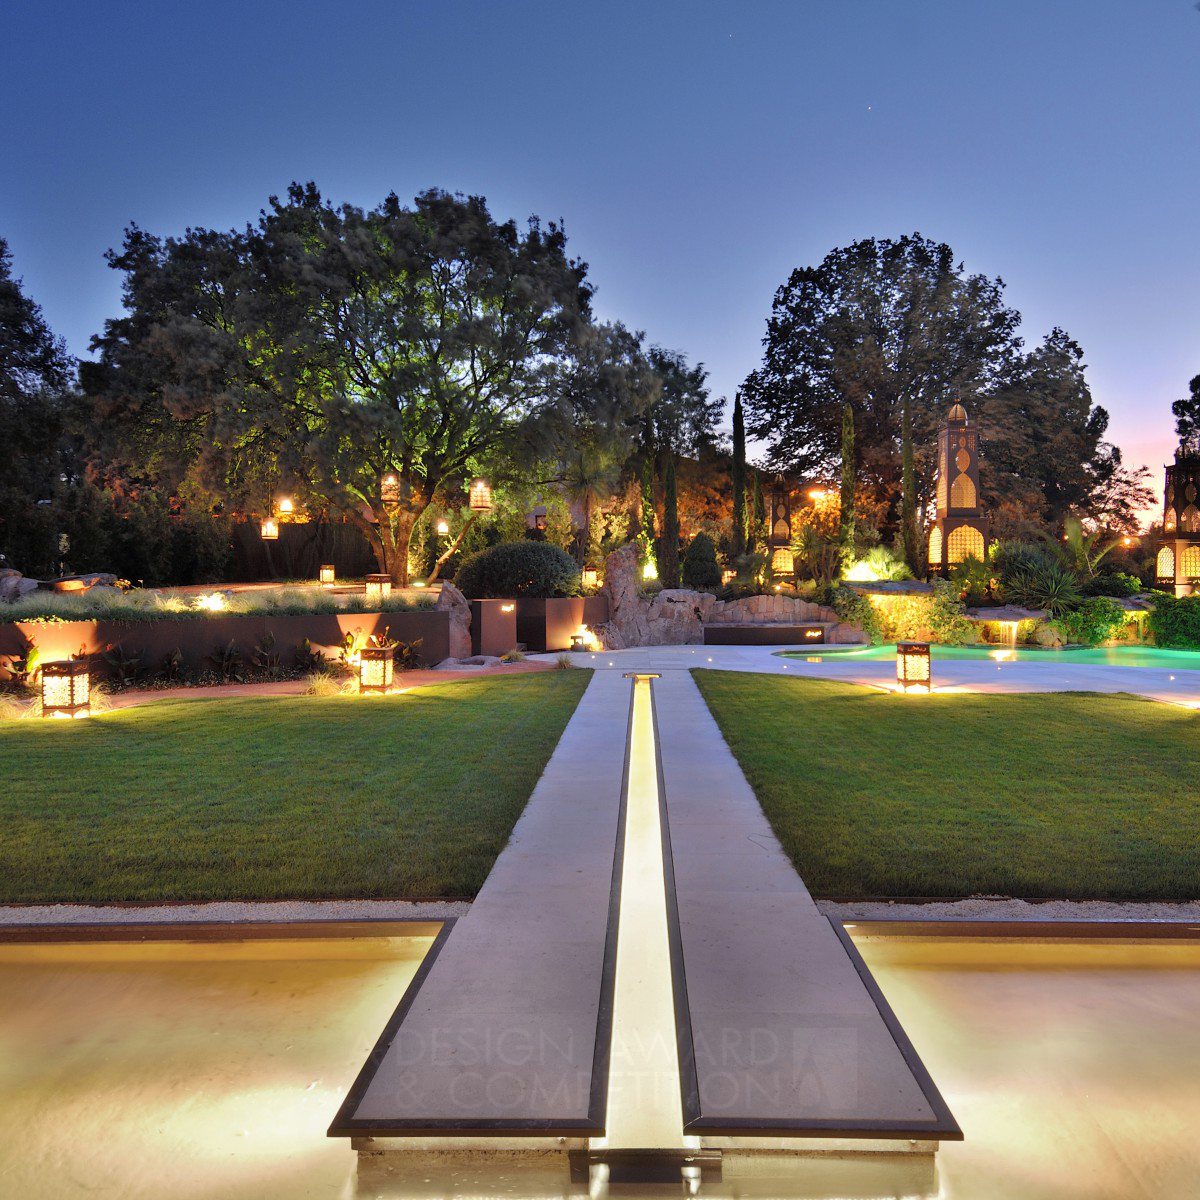 Ryad Private Garden